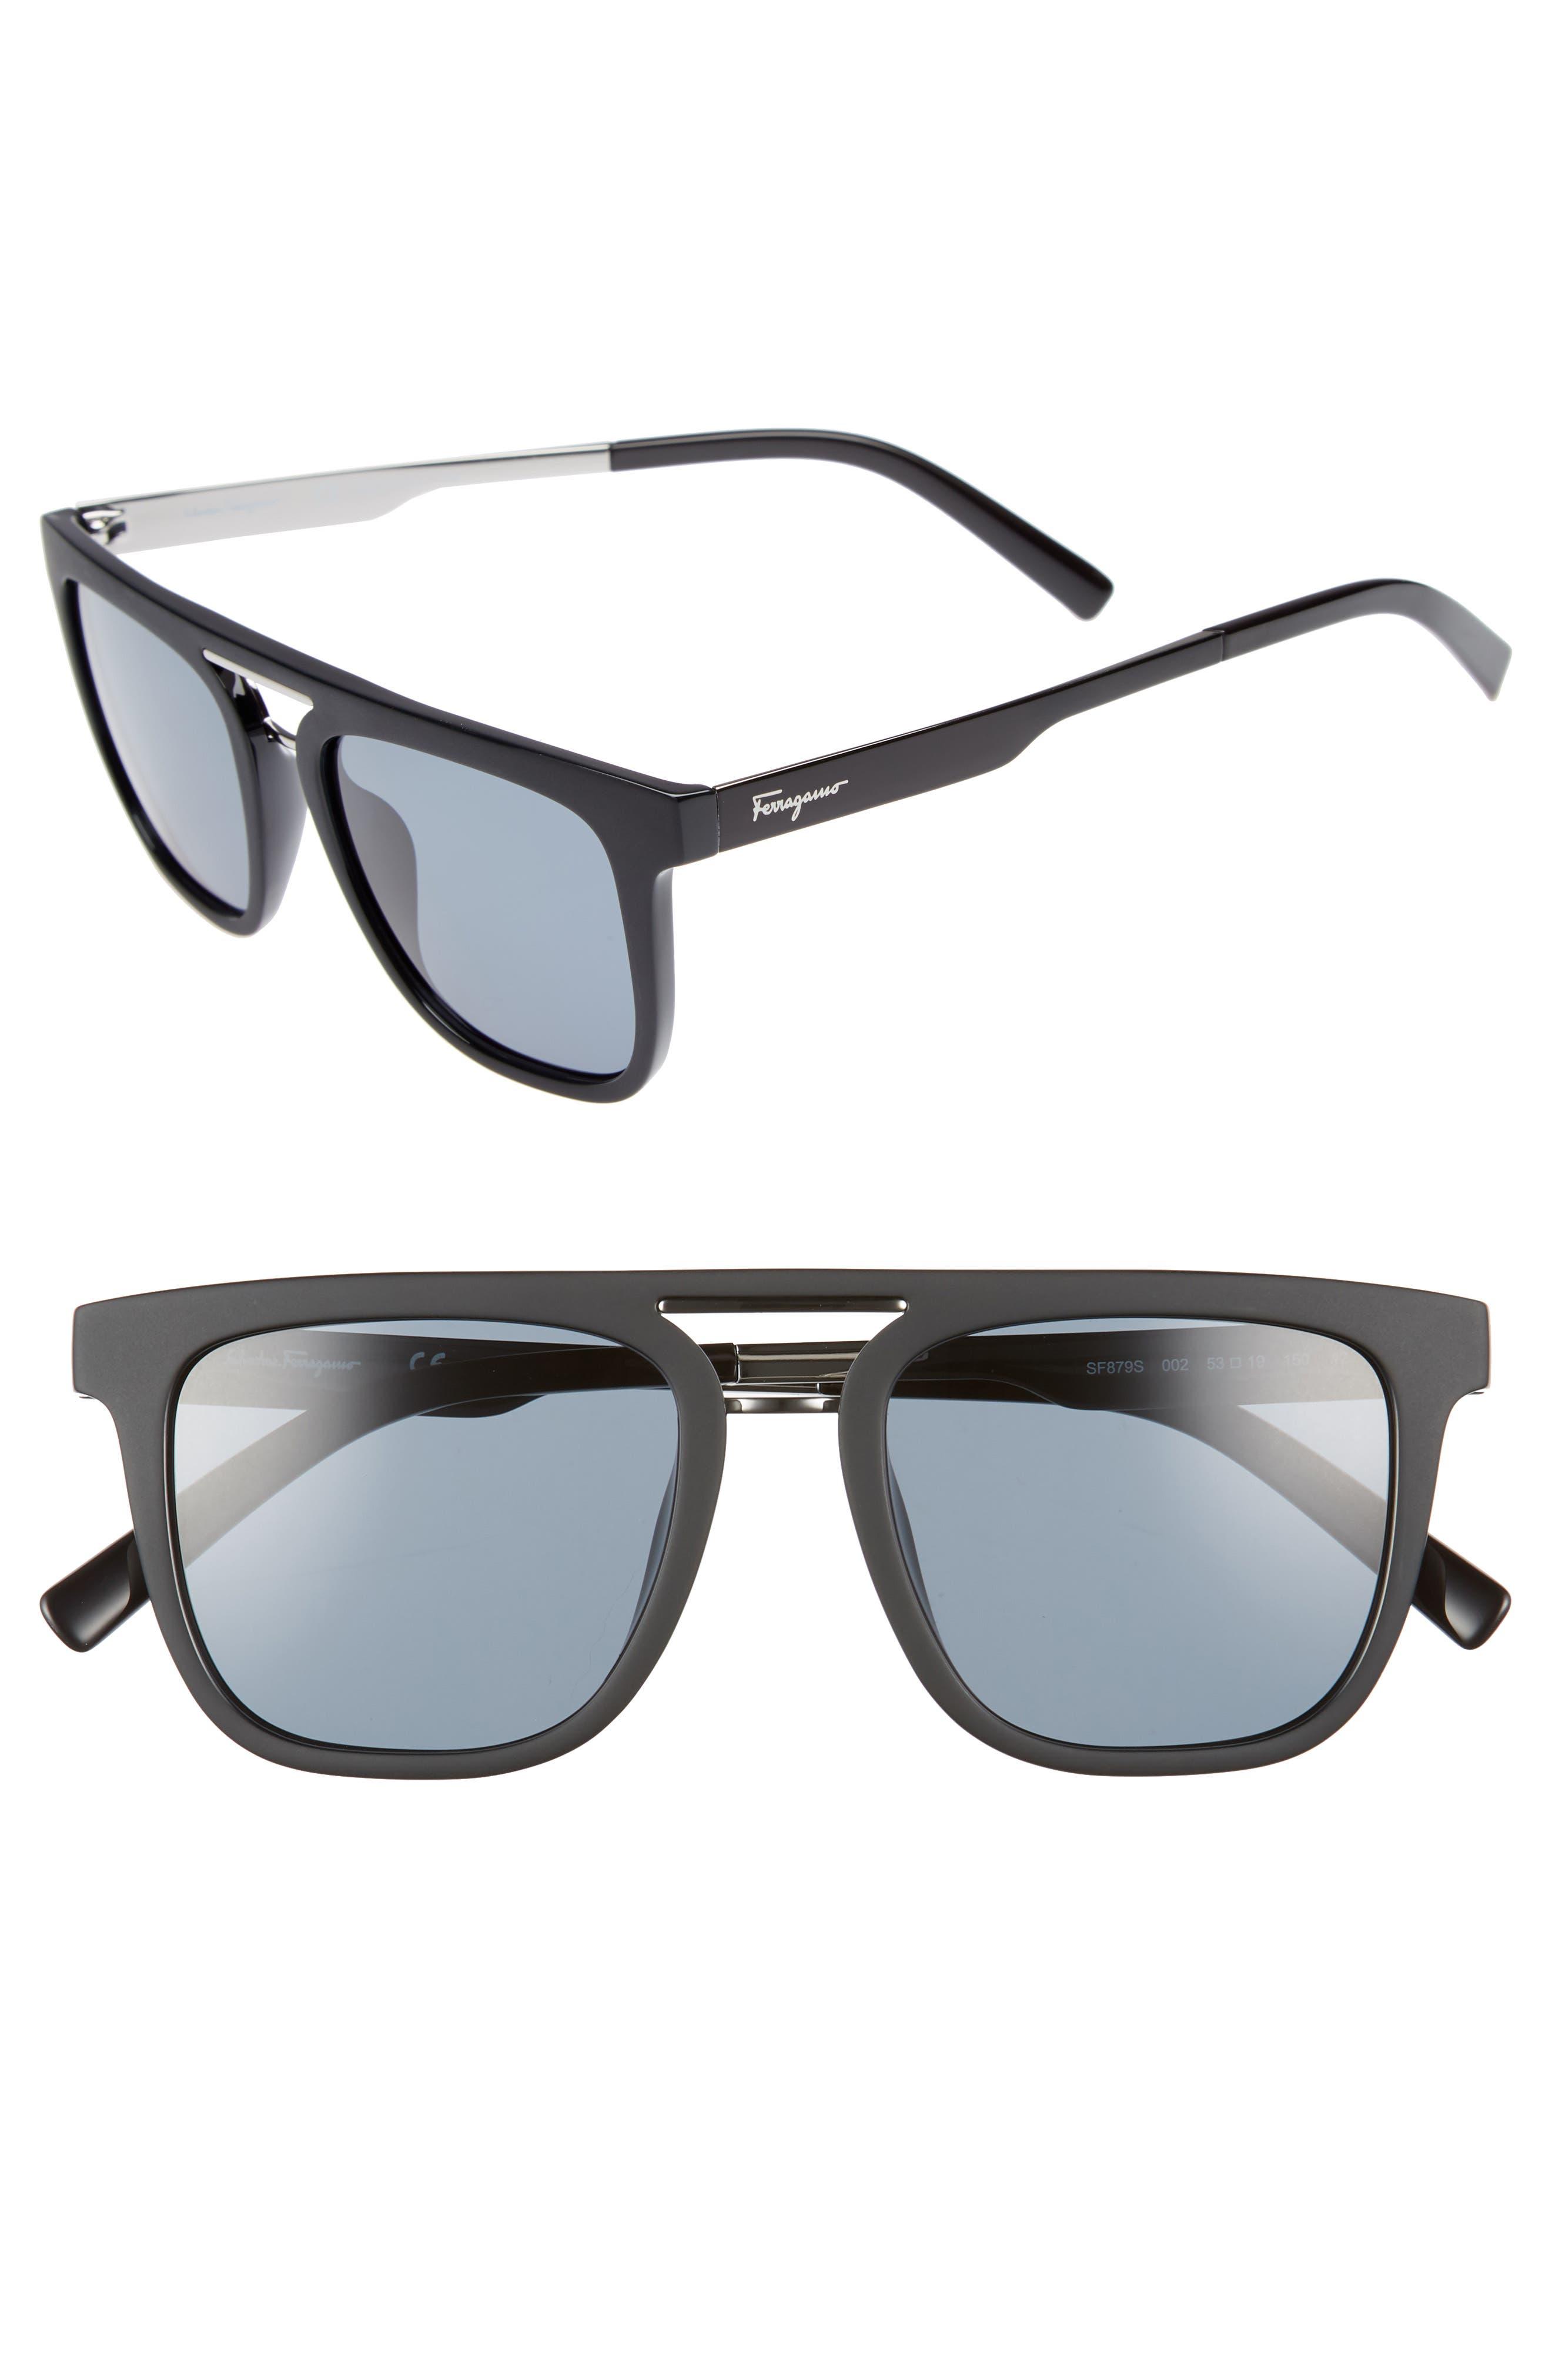 Main Image - Salvatore Ferragamo 53mm Sunglasses